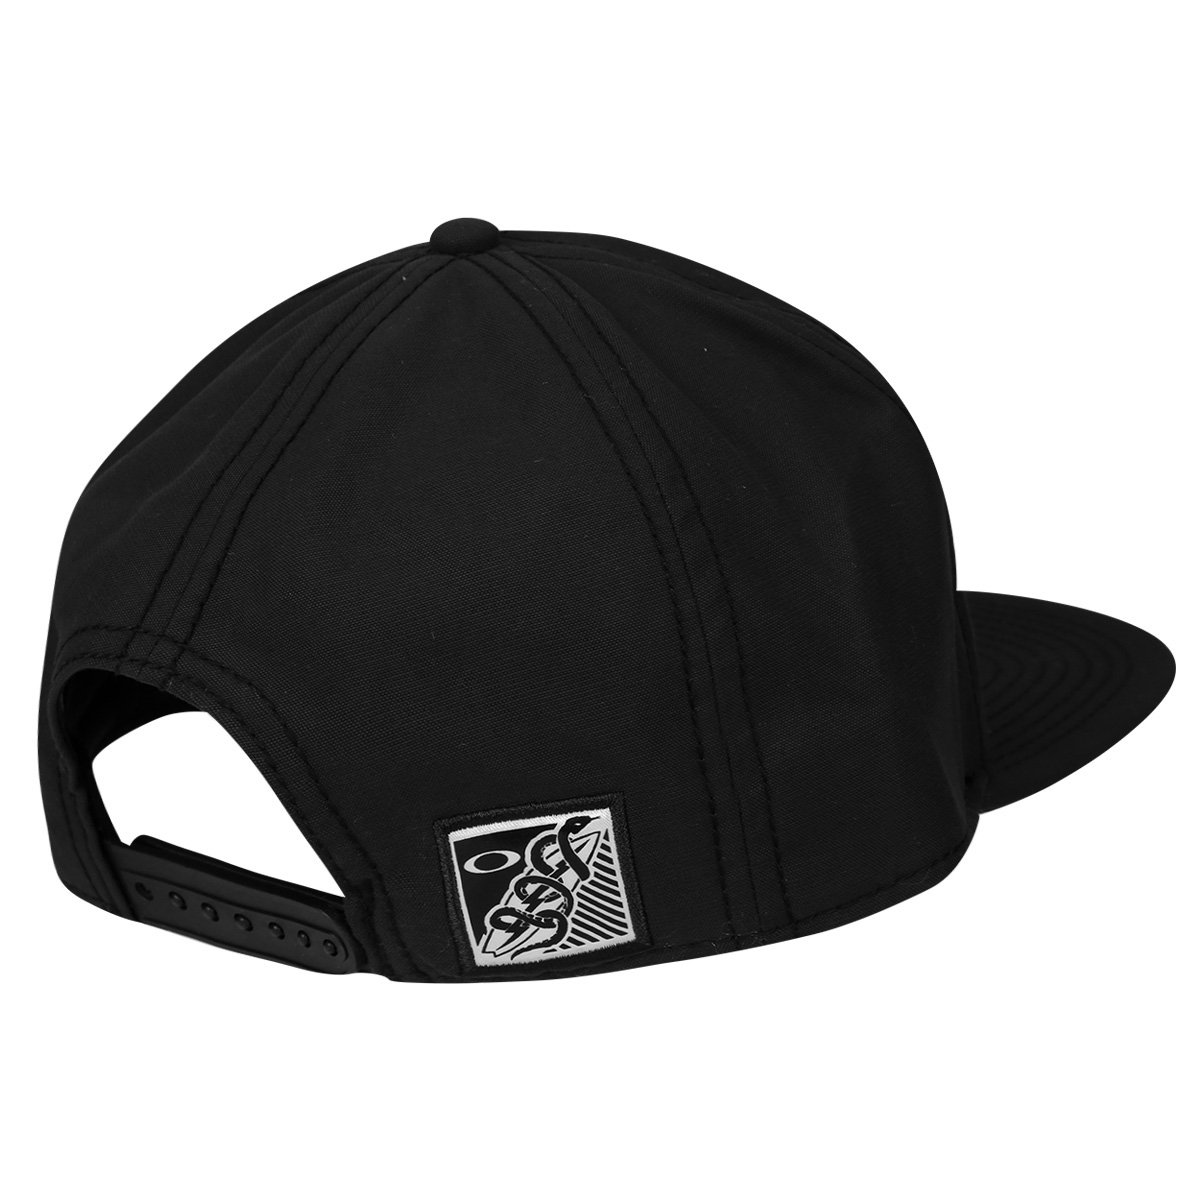 Boné Oakley The Point Hat - Preto - Compre Agora  c37c7849972